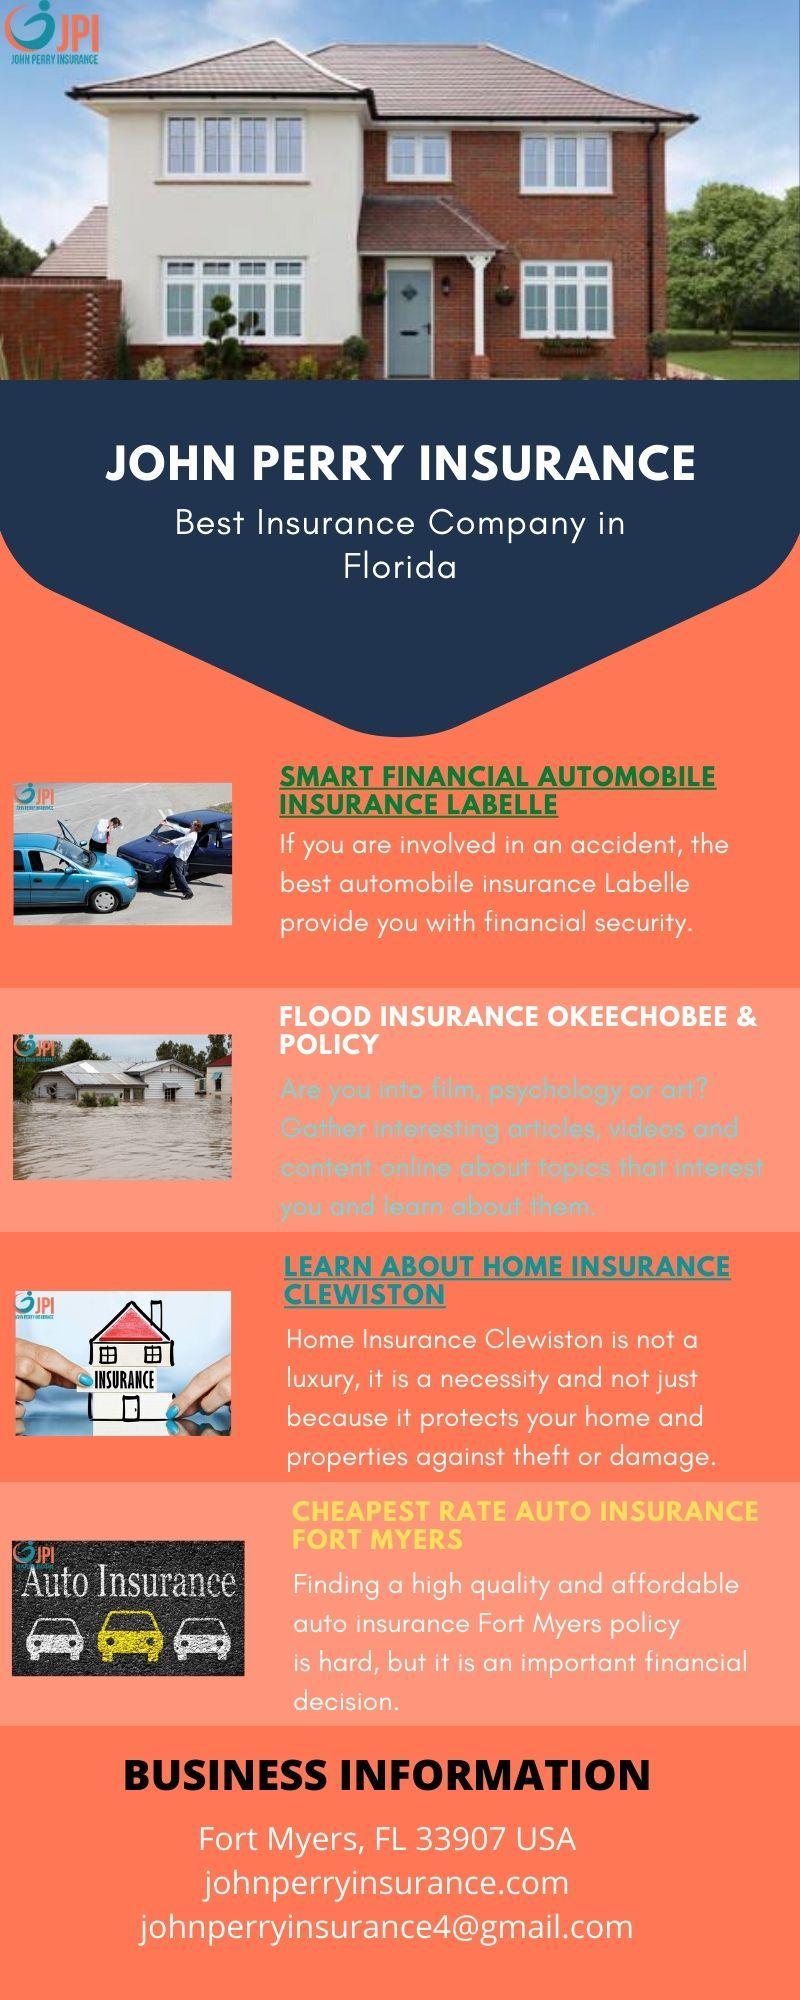 Best insurance company in florida in 2020 best insurance